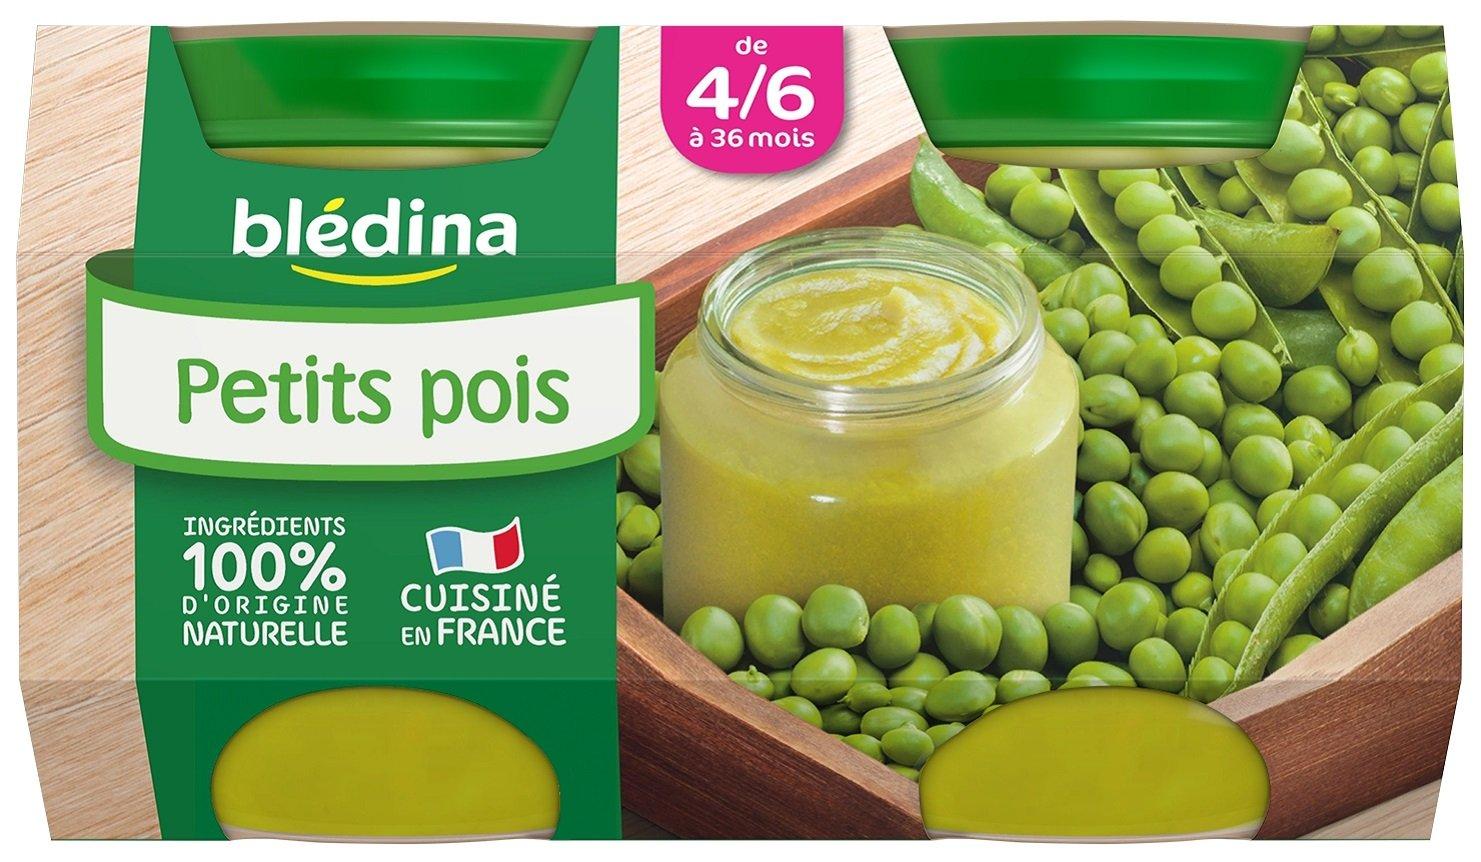 Blé dina Mon 1er Petit Pot Petits Pois dè s 4/6 mois 2 x 130 g - Pack de 12 BLEDINA 3041091022844